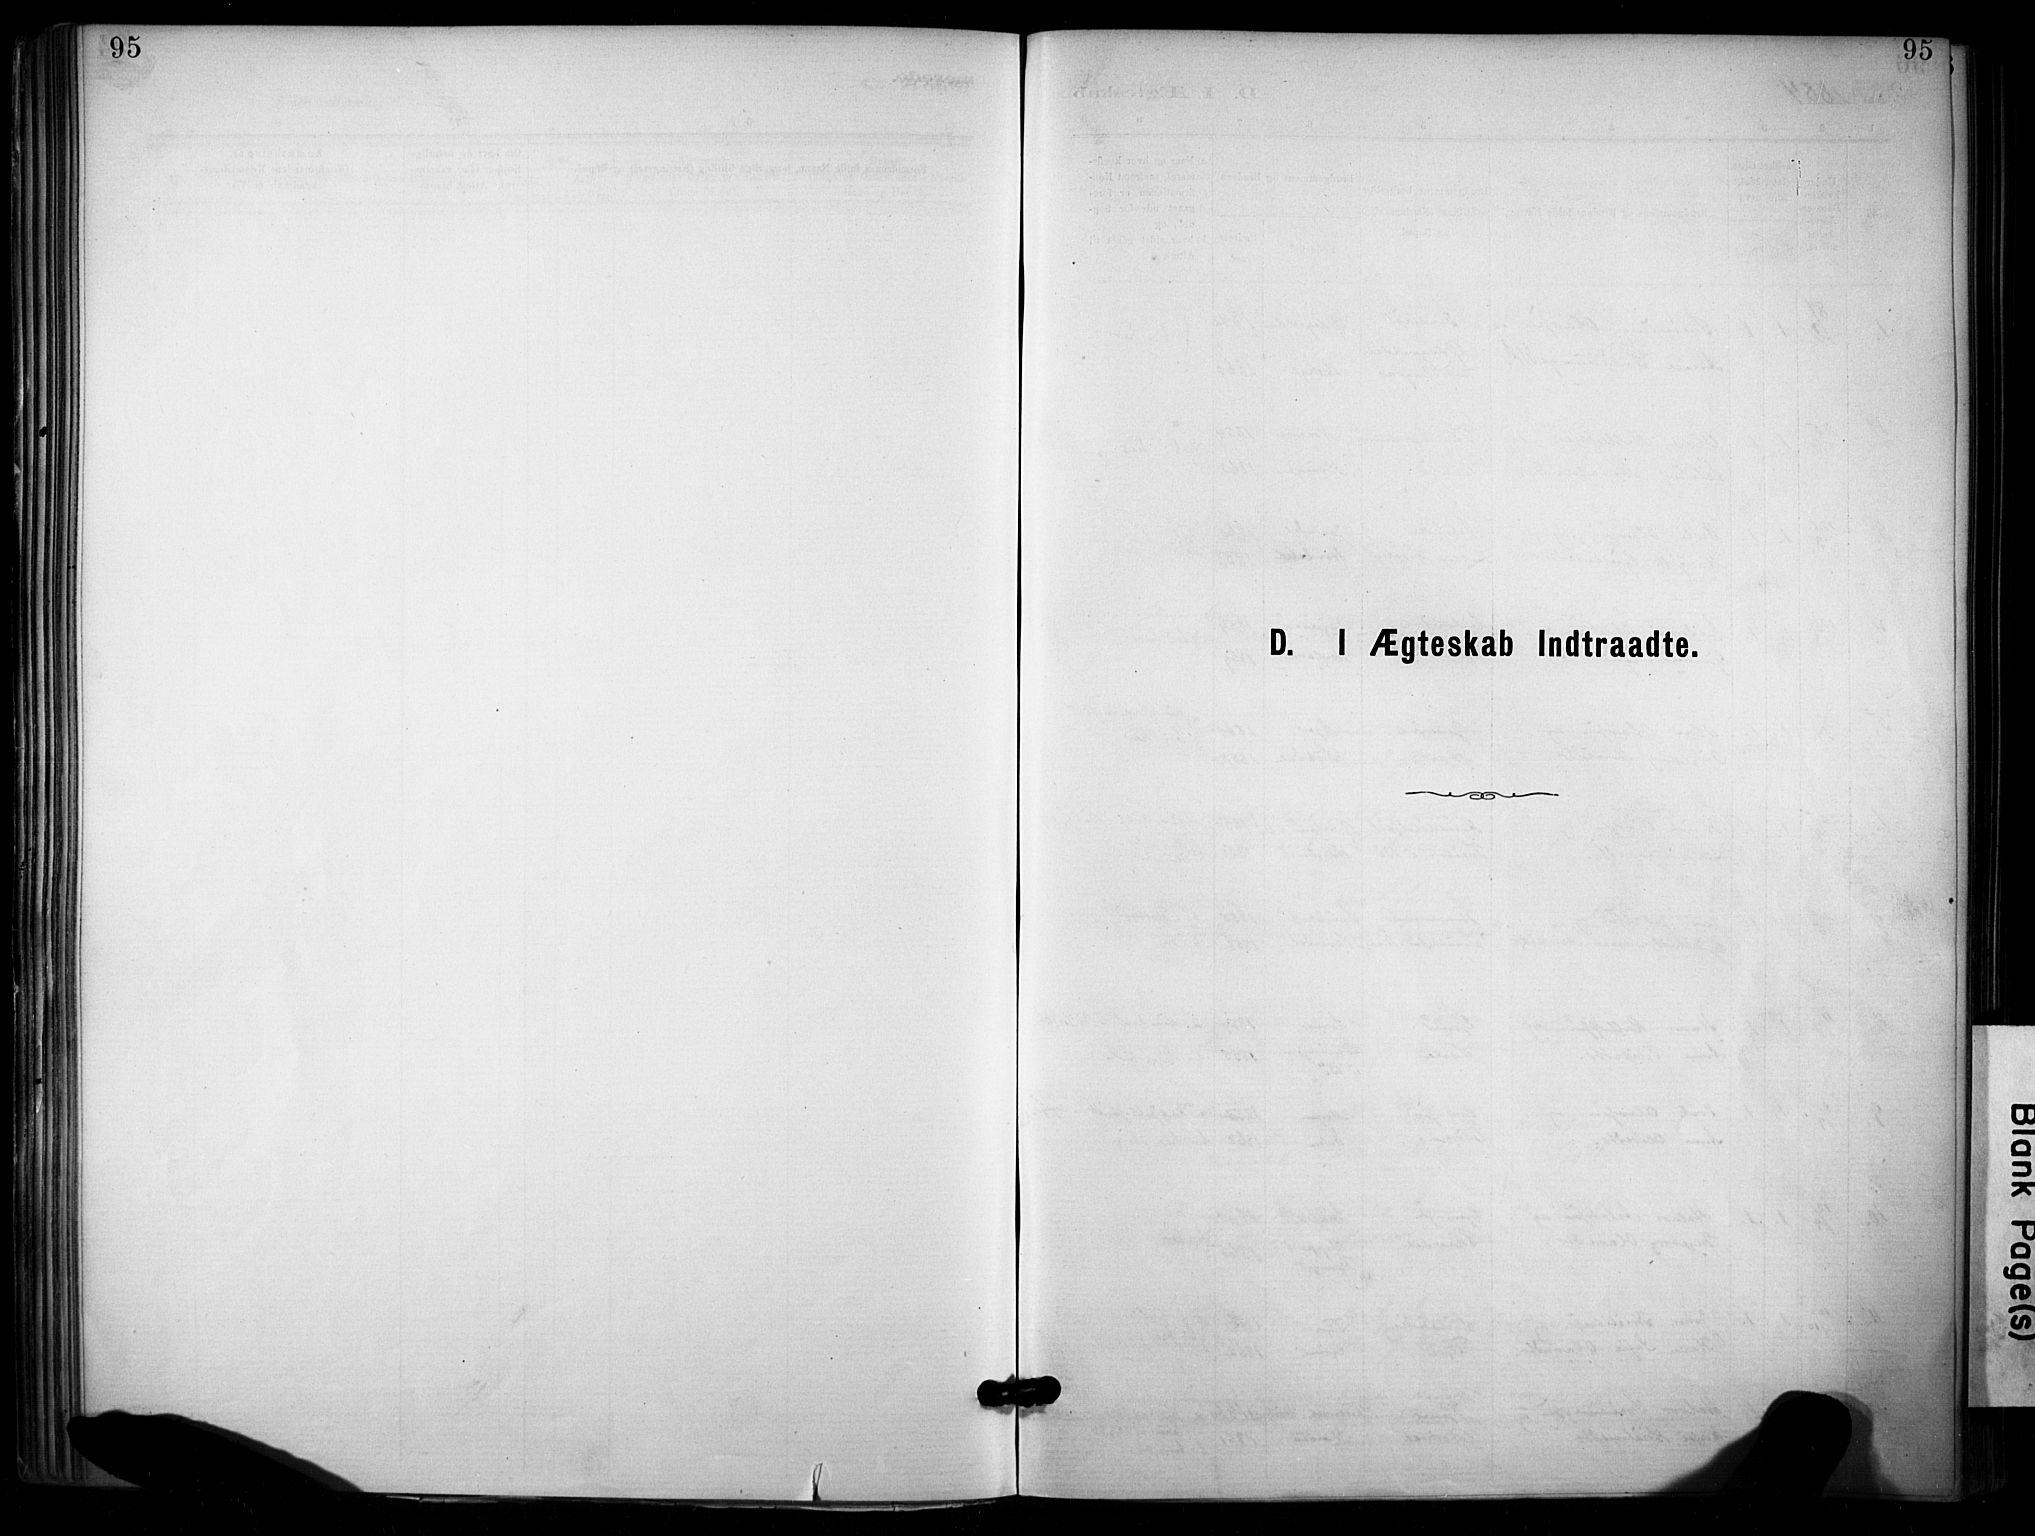 SAKO, Lunde kirkebøker, F/Fa/L0002: Ministerialbok nr. I 2, 1884-1892, s. 95